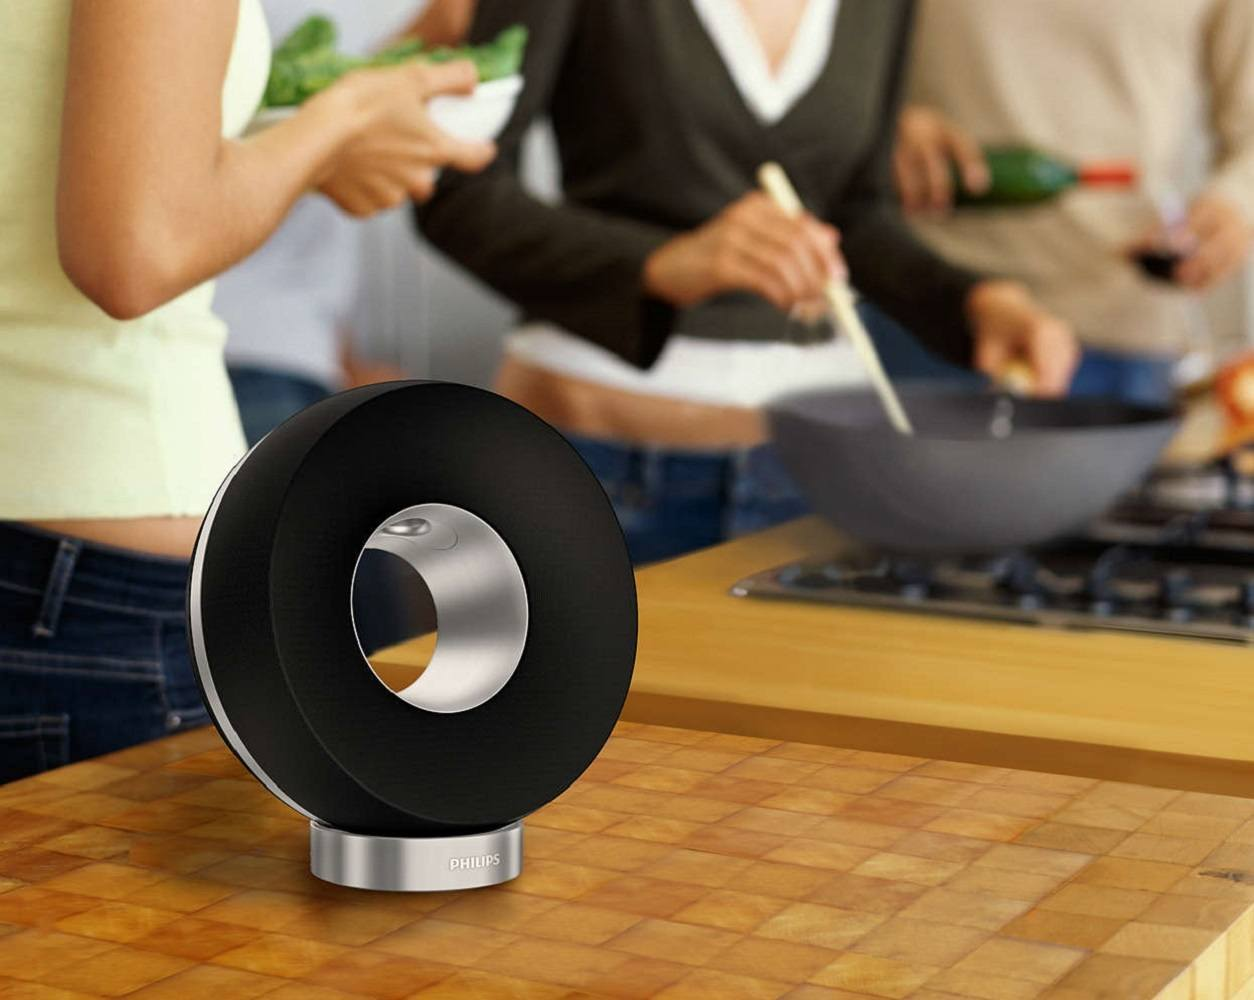 Philips Fidelio Wireless Speakers AirPlay